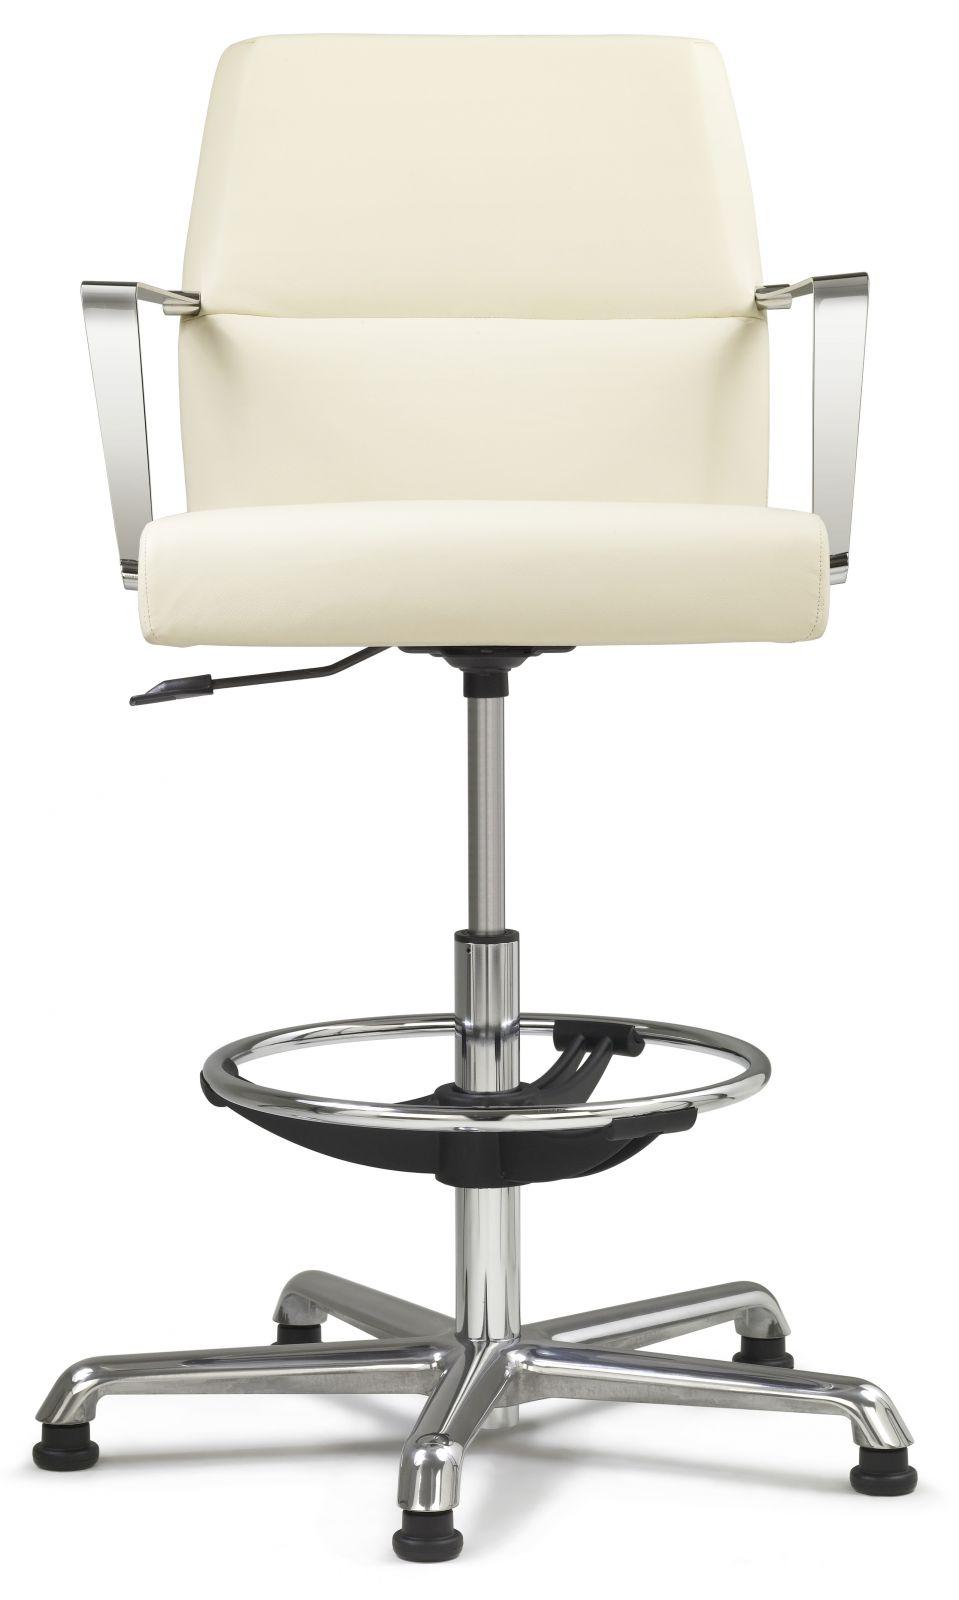 modern-bar-stools-Italian-furniture-large (11).jpg